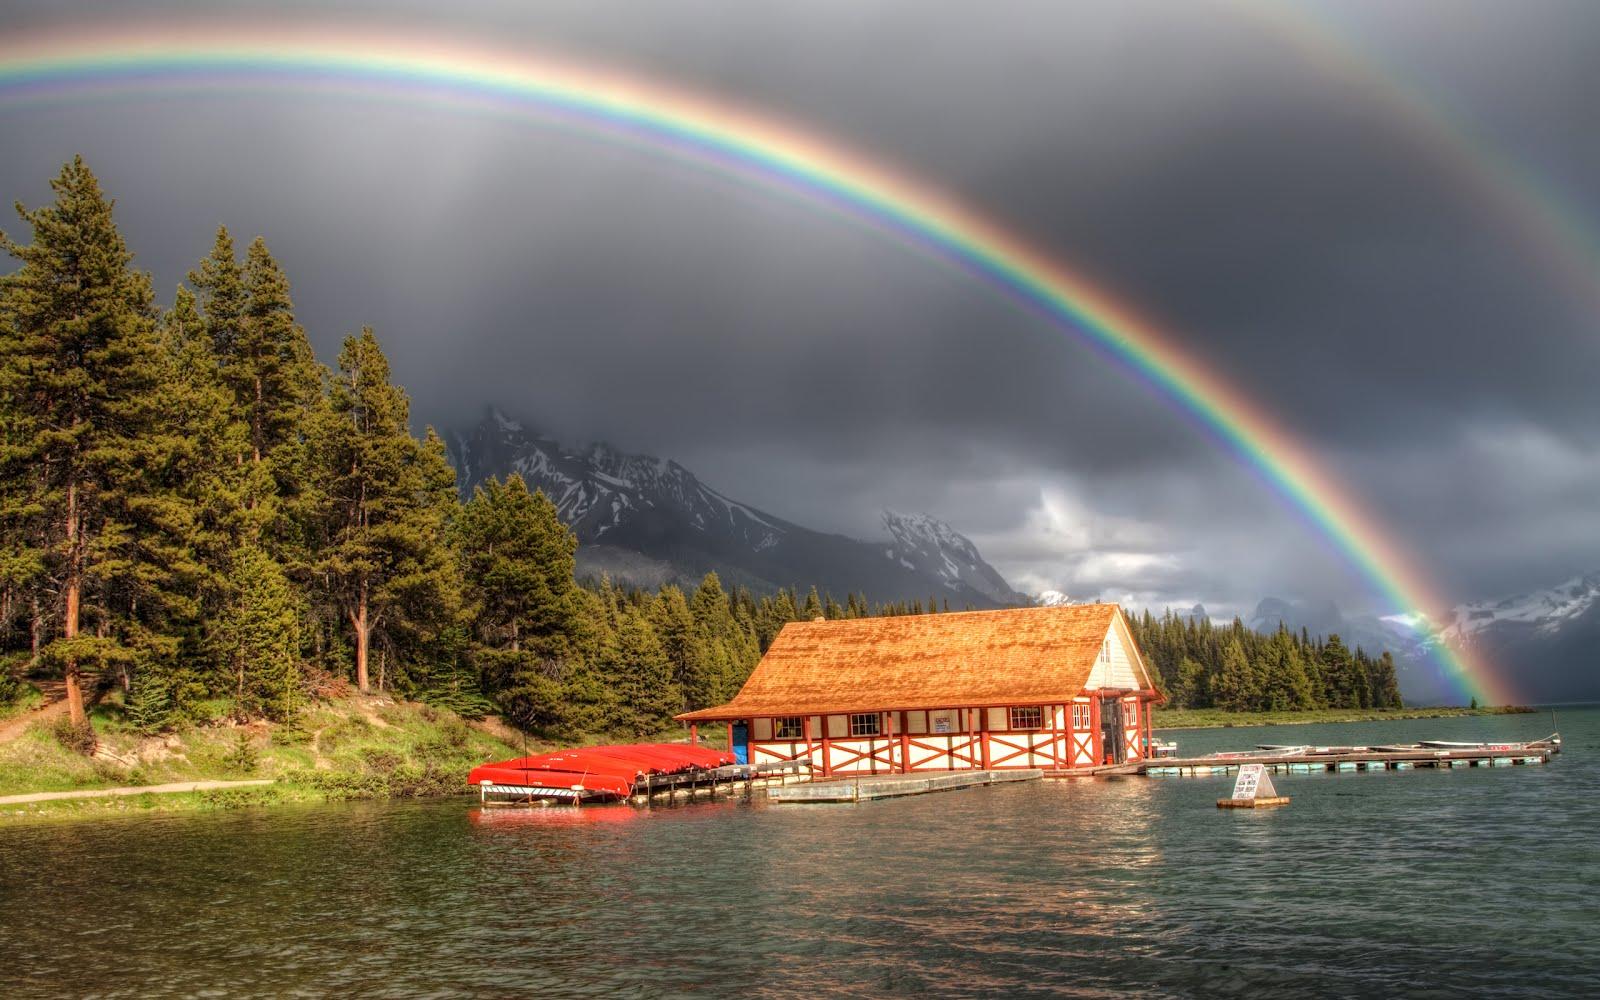 Amazing Wallpaper High Resolution Rainbow - rainbow%2Bbackground%2B05  Perfect Image Reference_100656.jpg